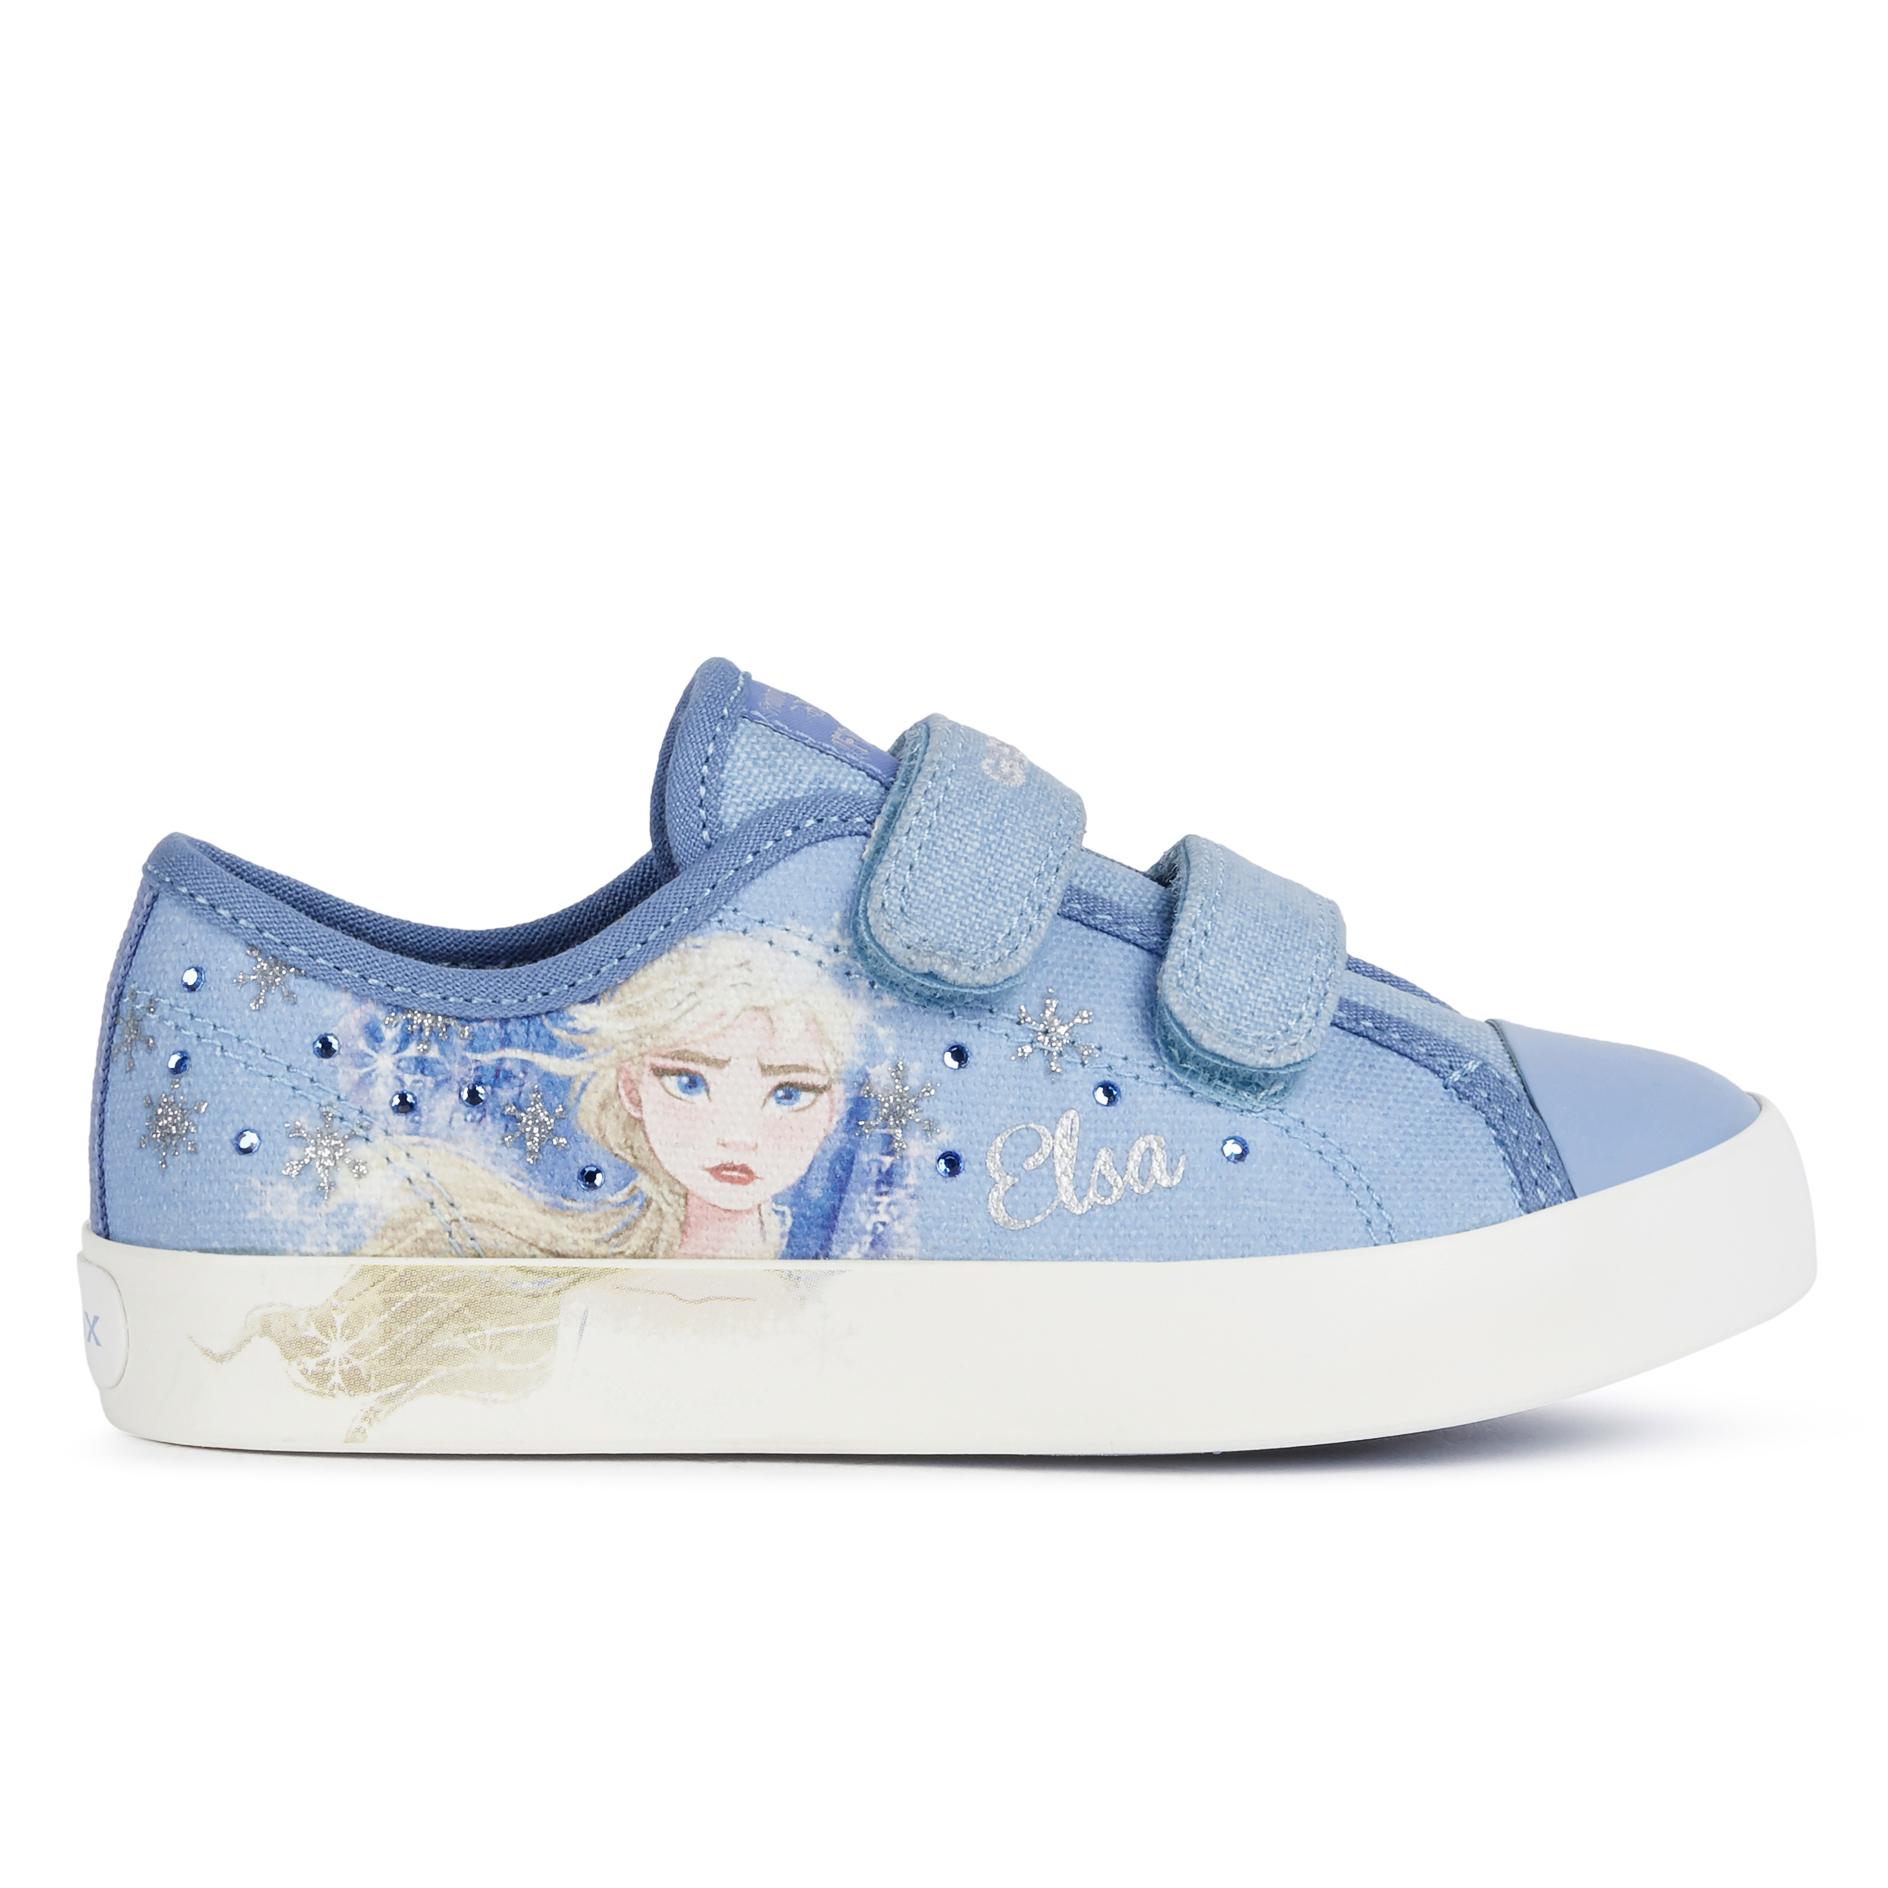 Geox Ciak Girl Frozen Shoes Blue Elsa